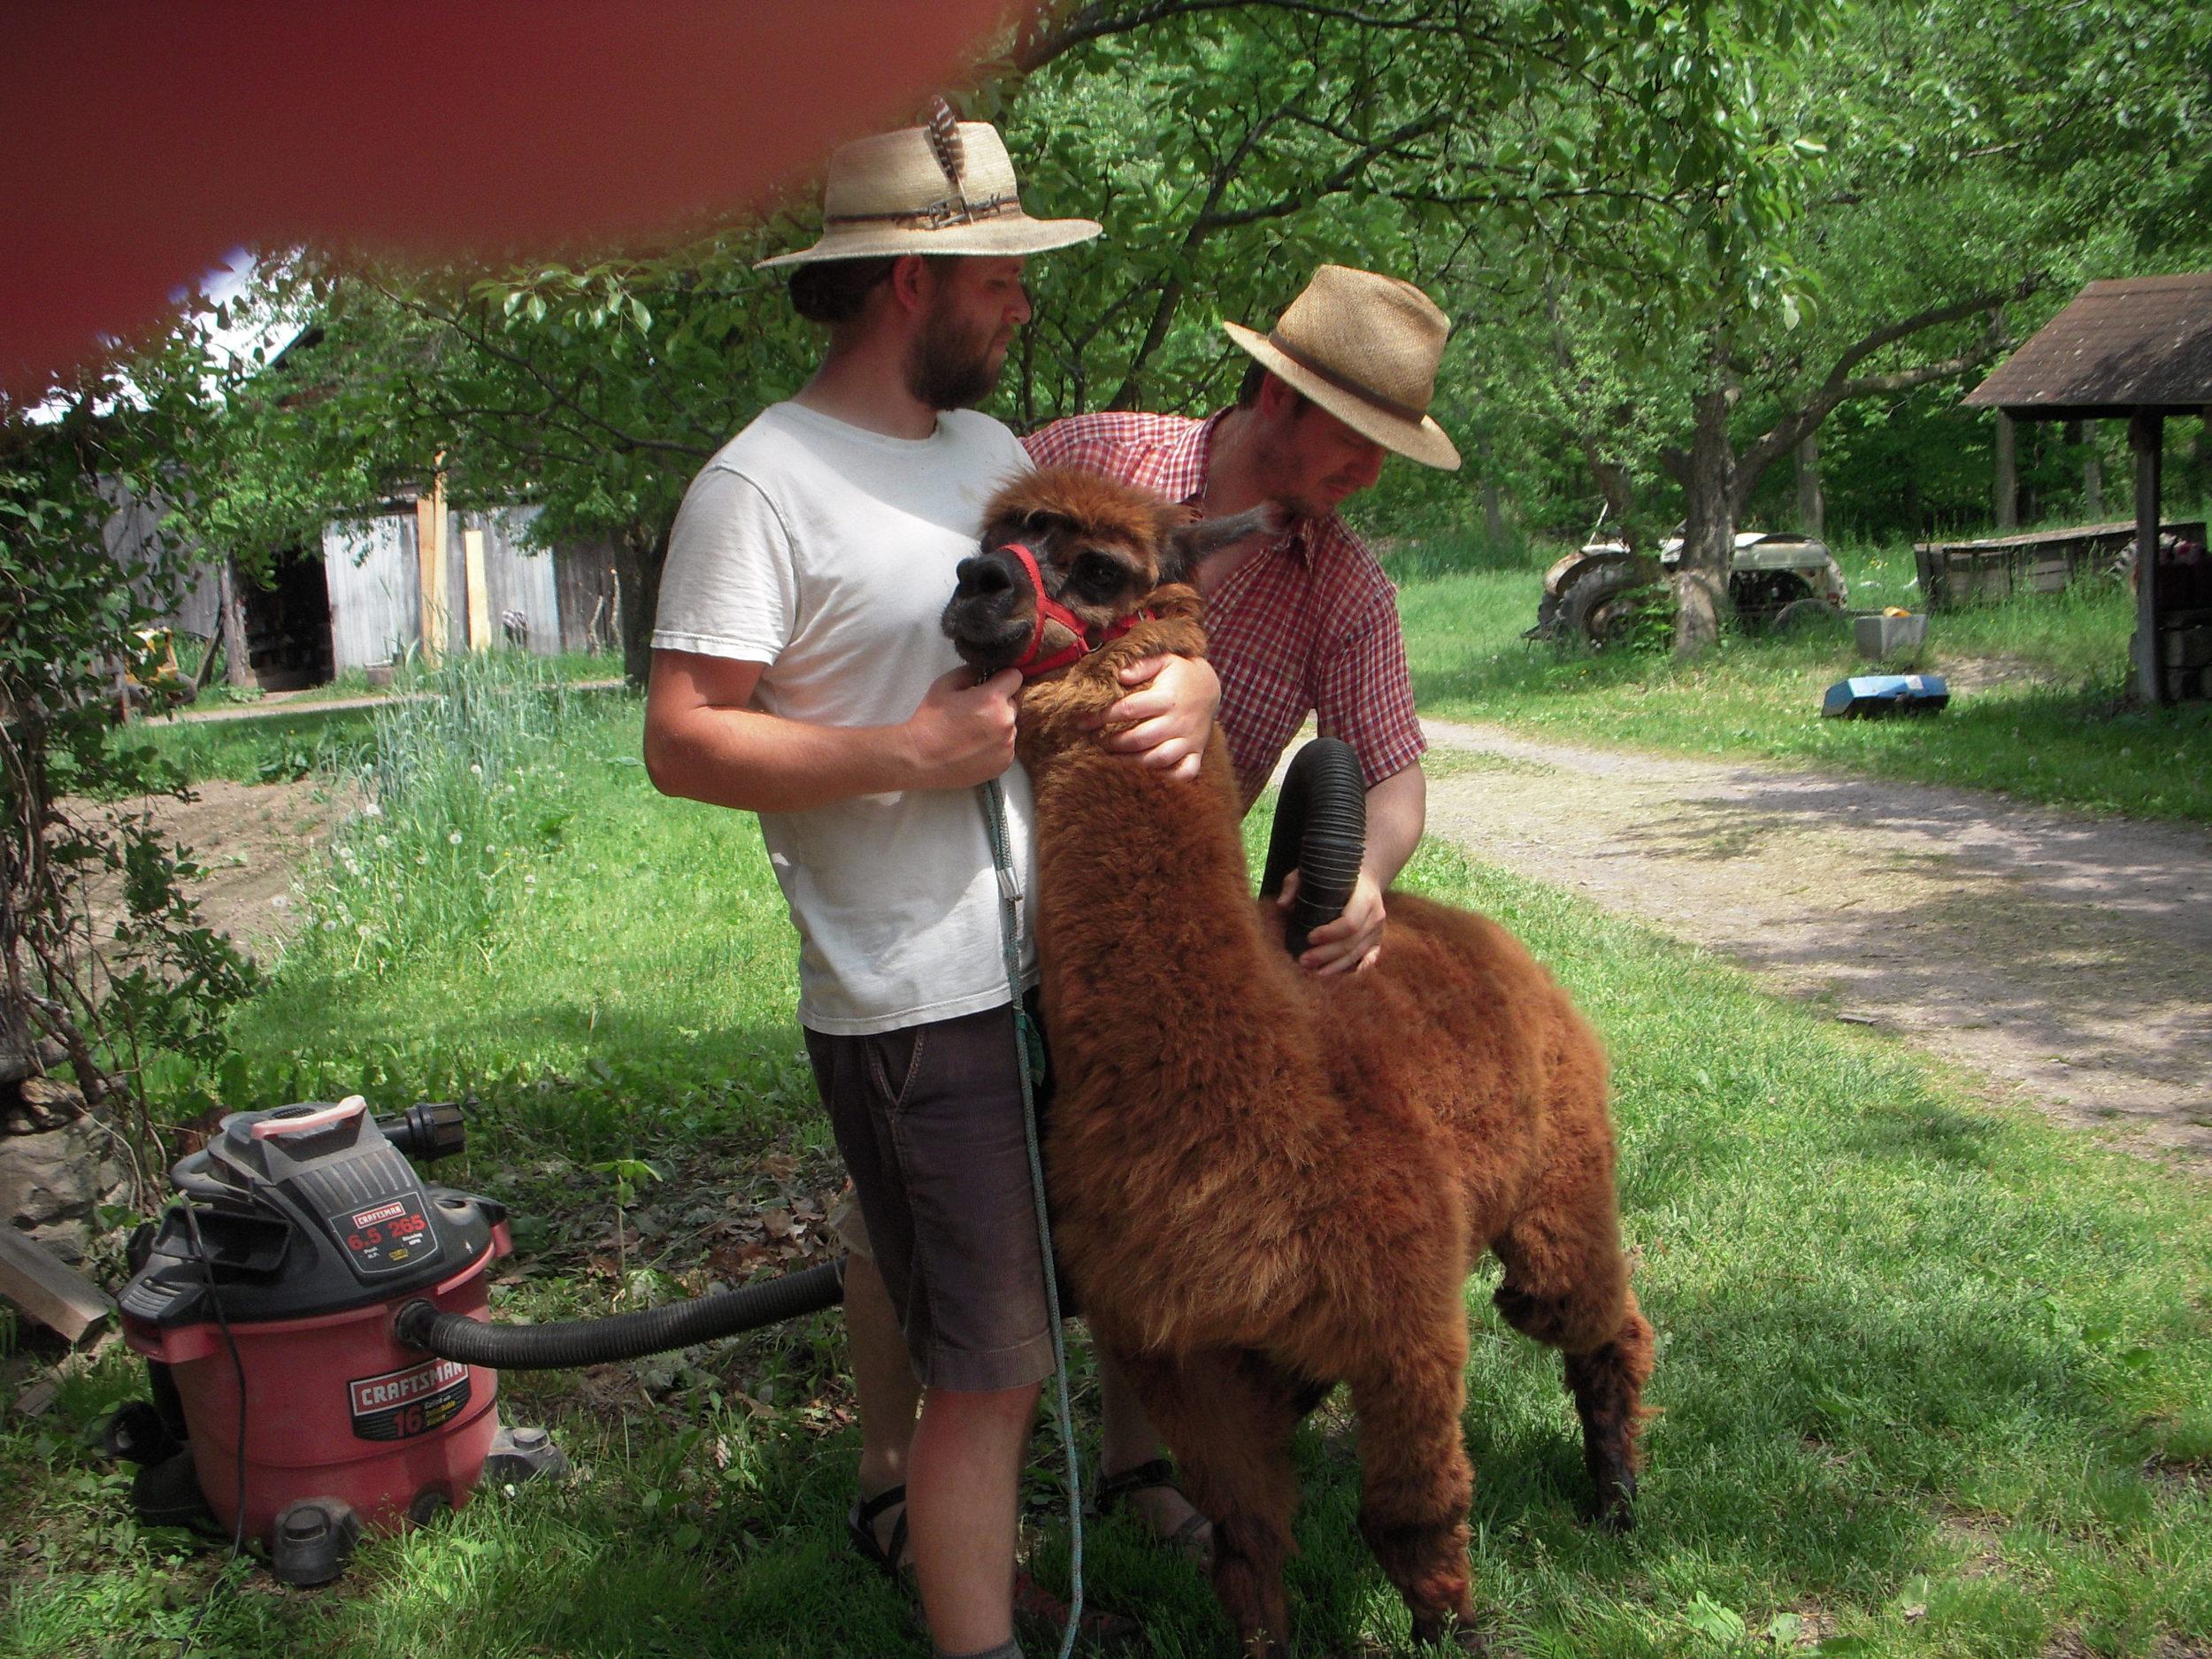 JourneysEndFarm_Alpacas2016-05-28 (3).JPG